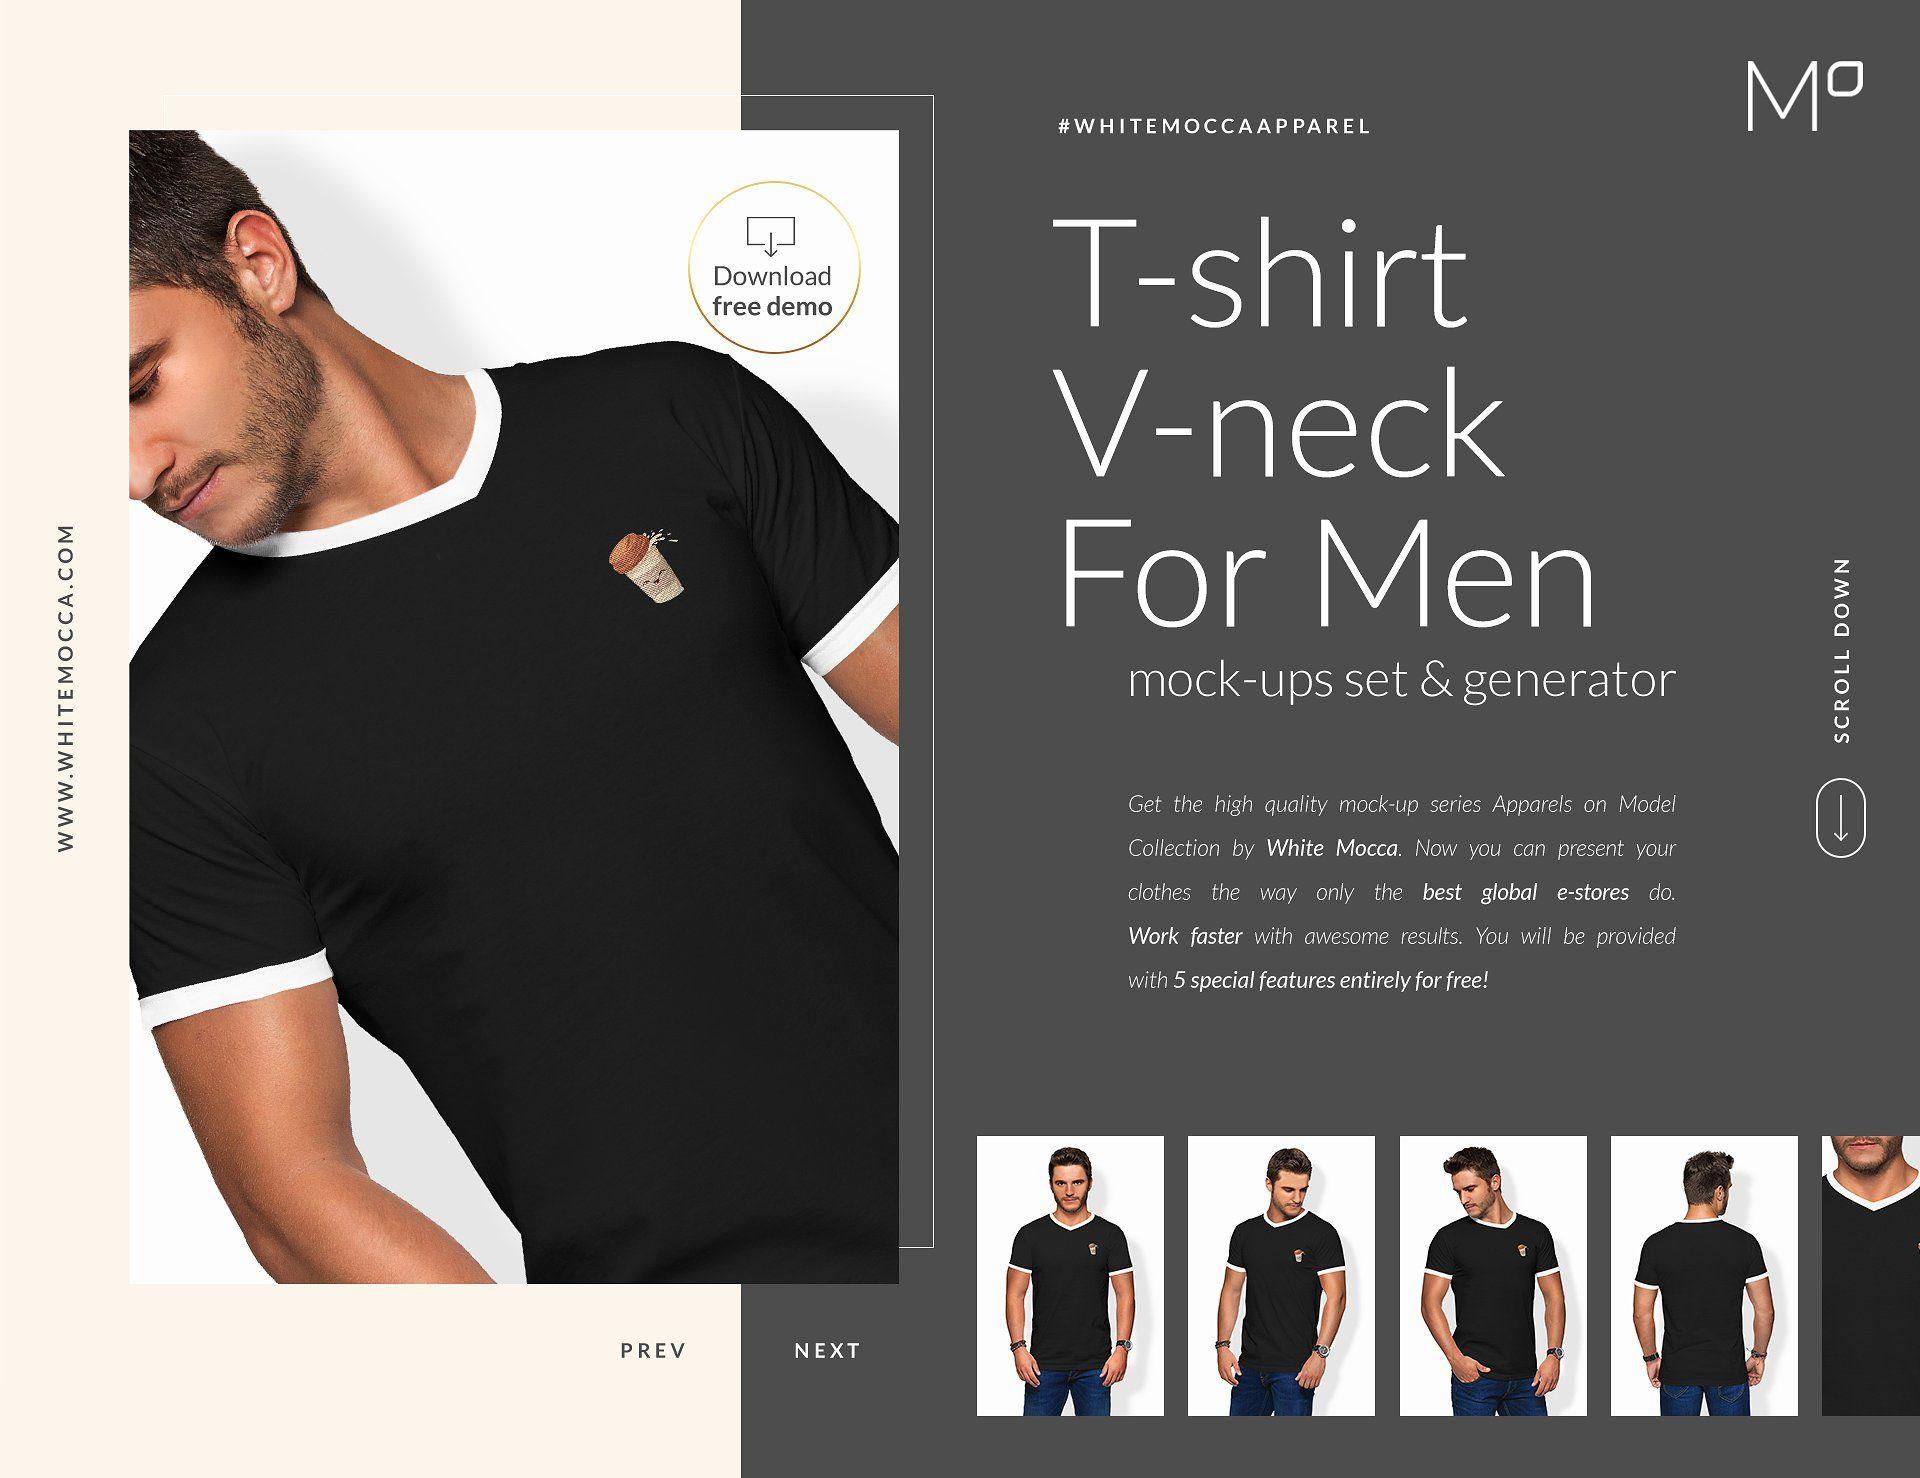 Download Men Vneck T Shirt Mock Ups Free Demo Simply Casual Selling Photos Mocking